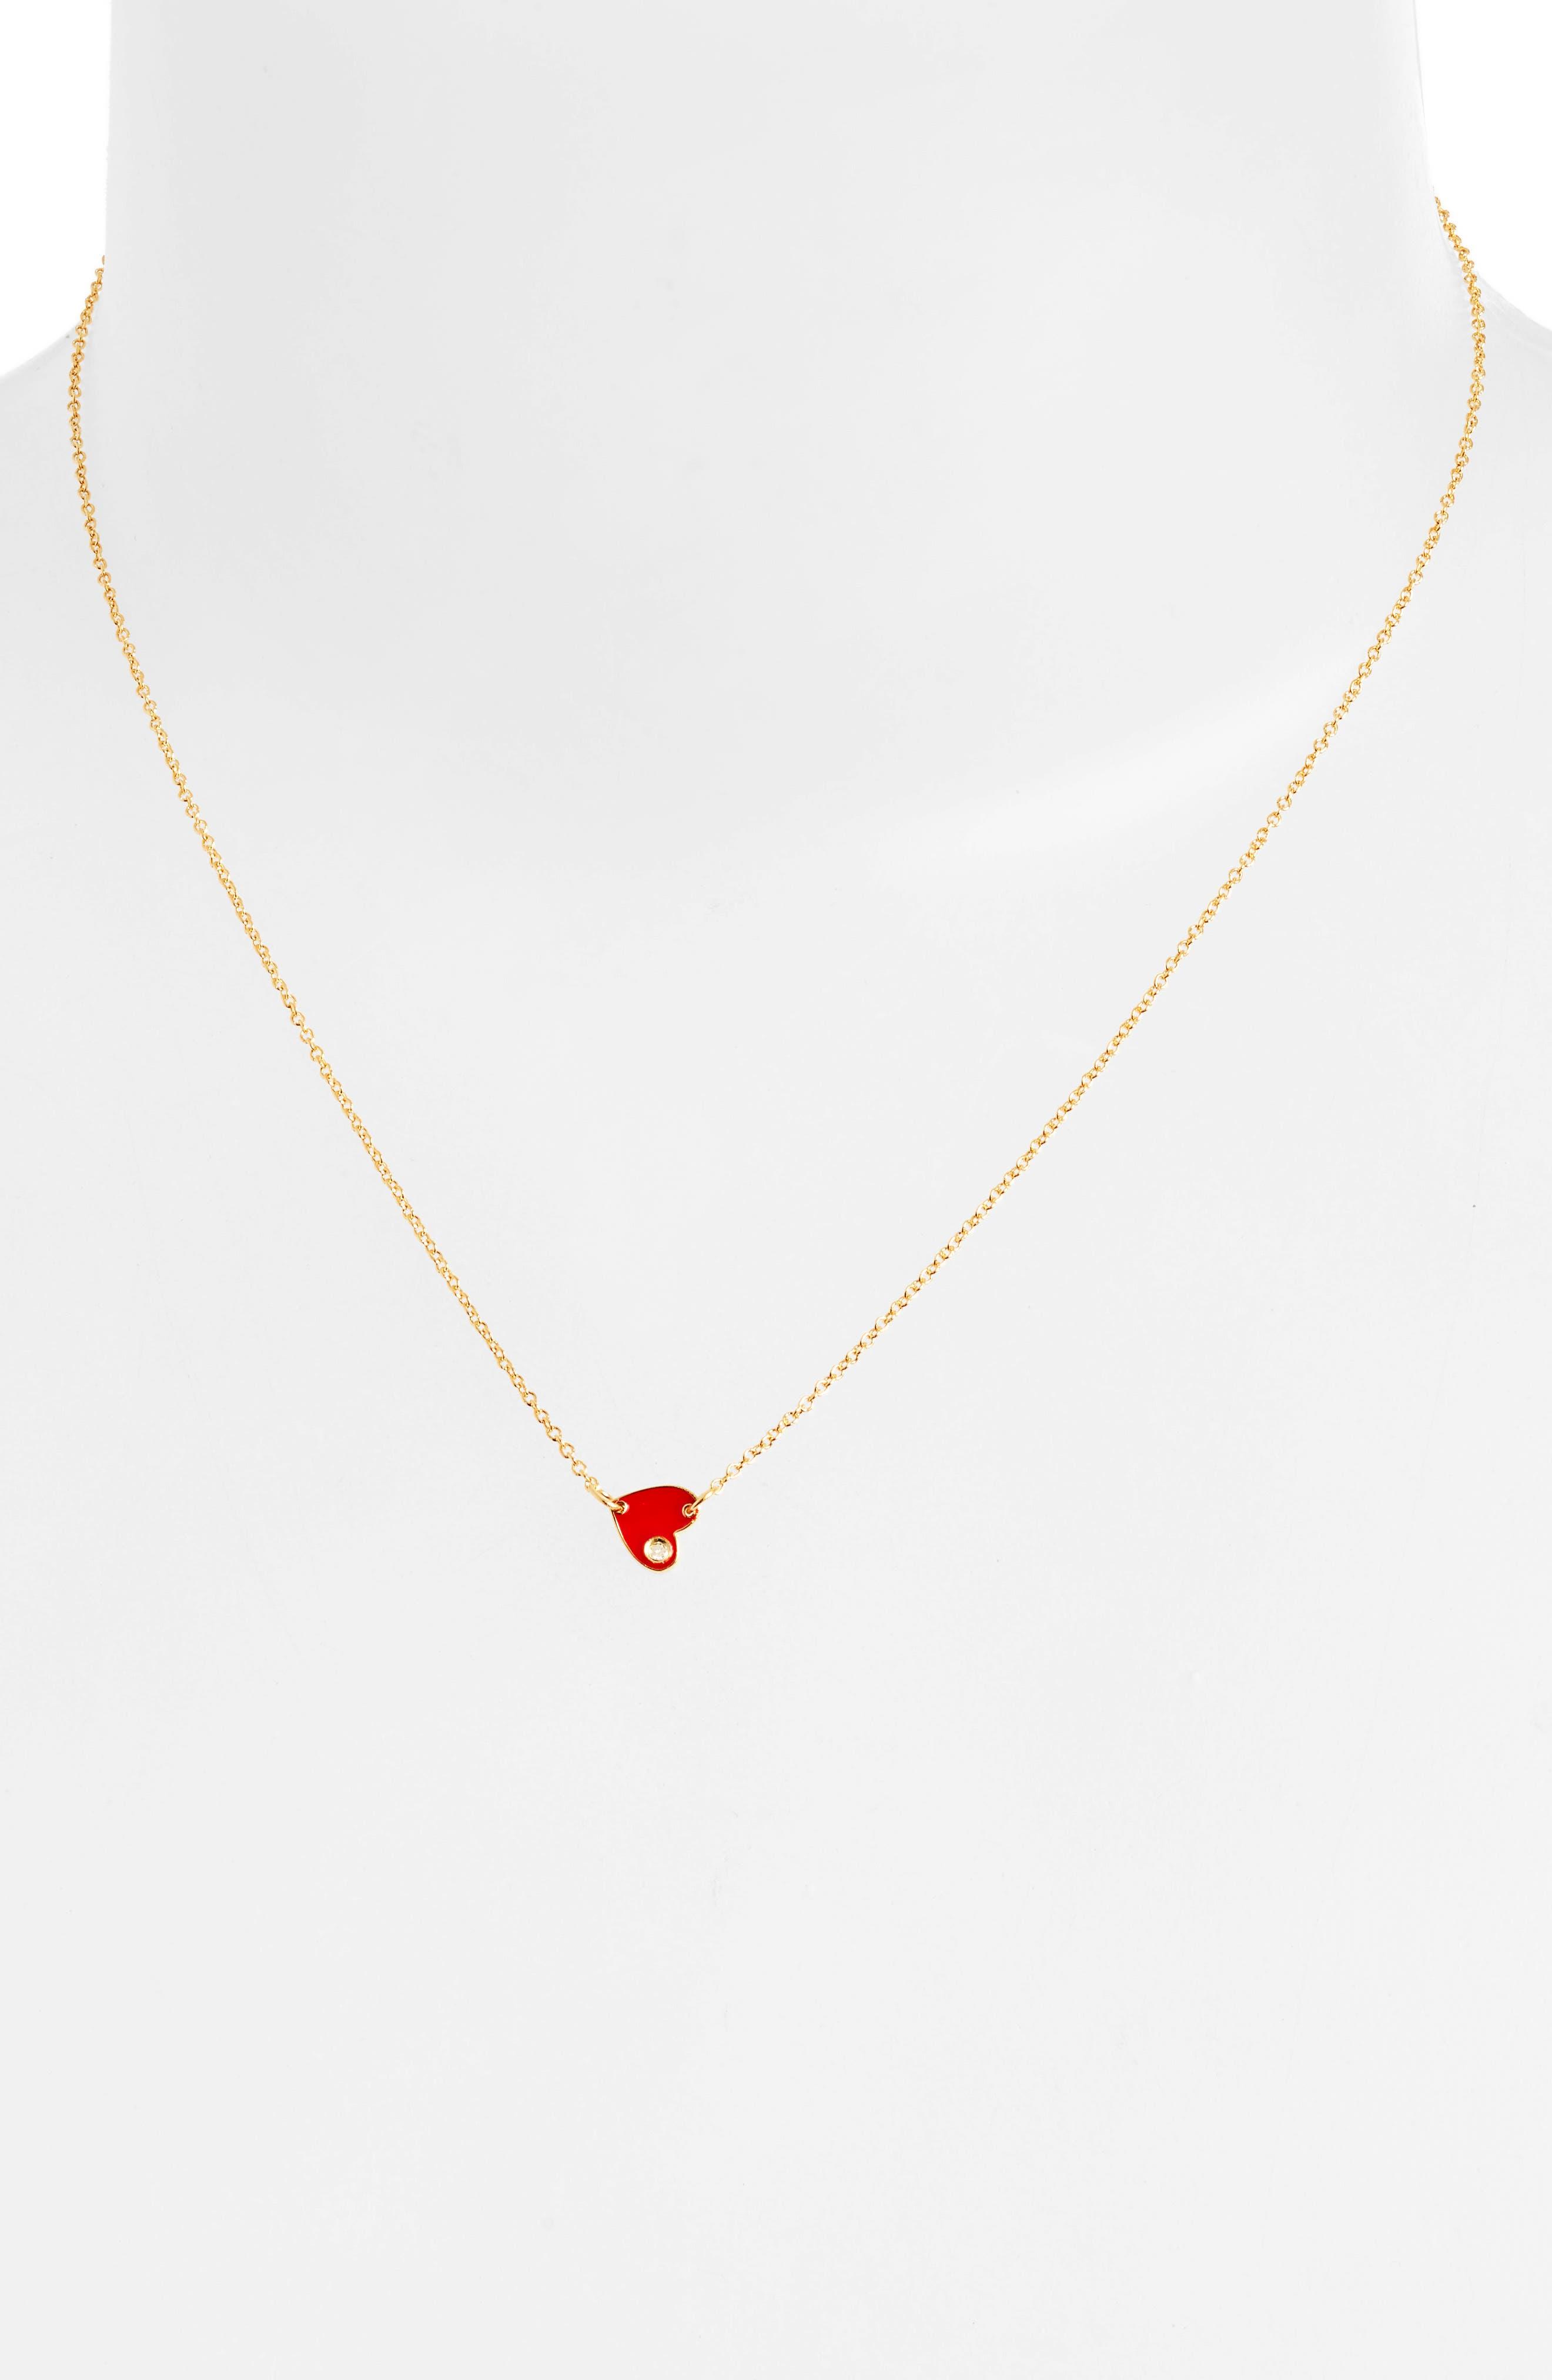 JENNIFER ZEUNER, Mia Mini Diamond Pendant Necklace, Alternate thumbnail 2, color, RED ENAMEL/GOLD VERMEIL